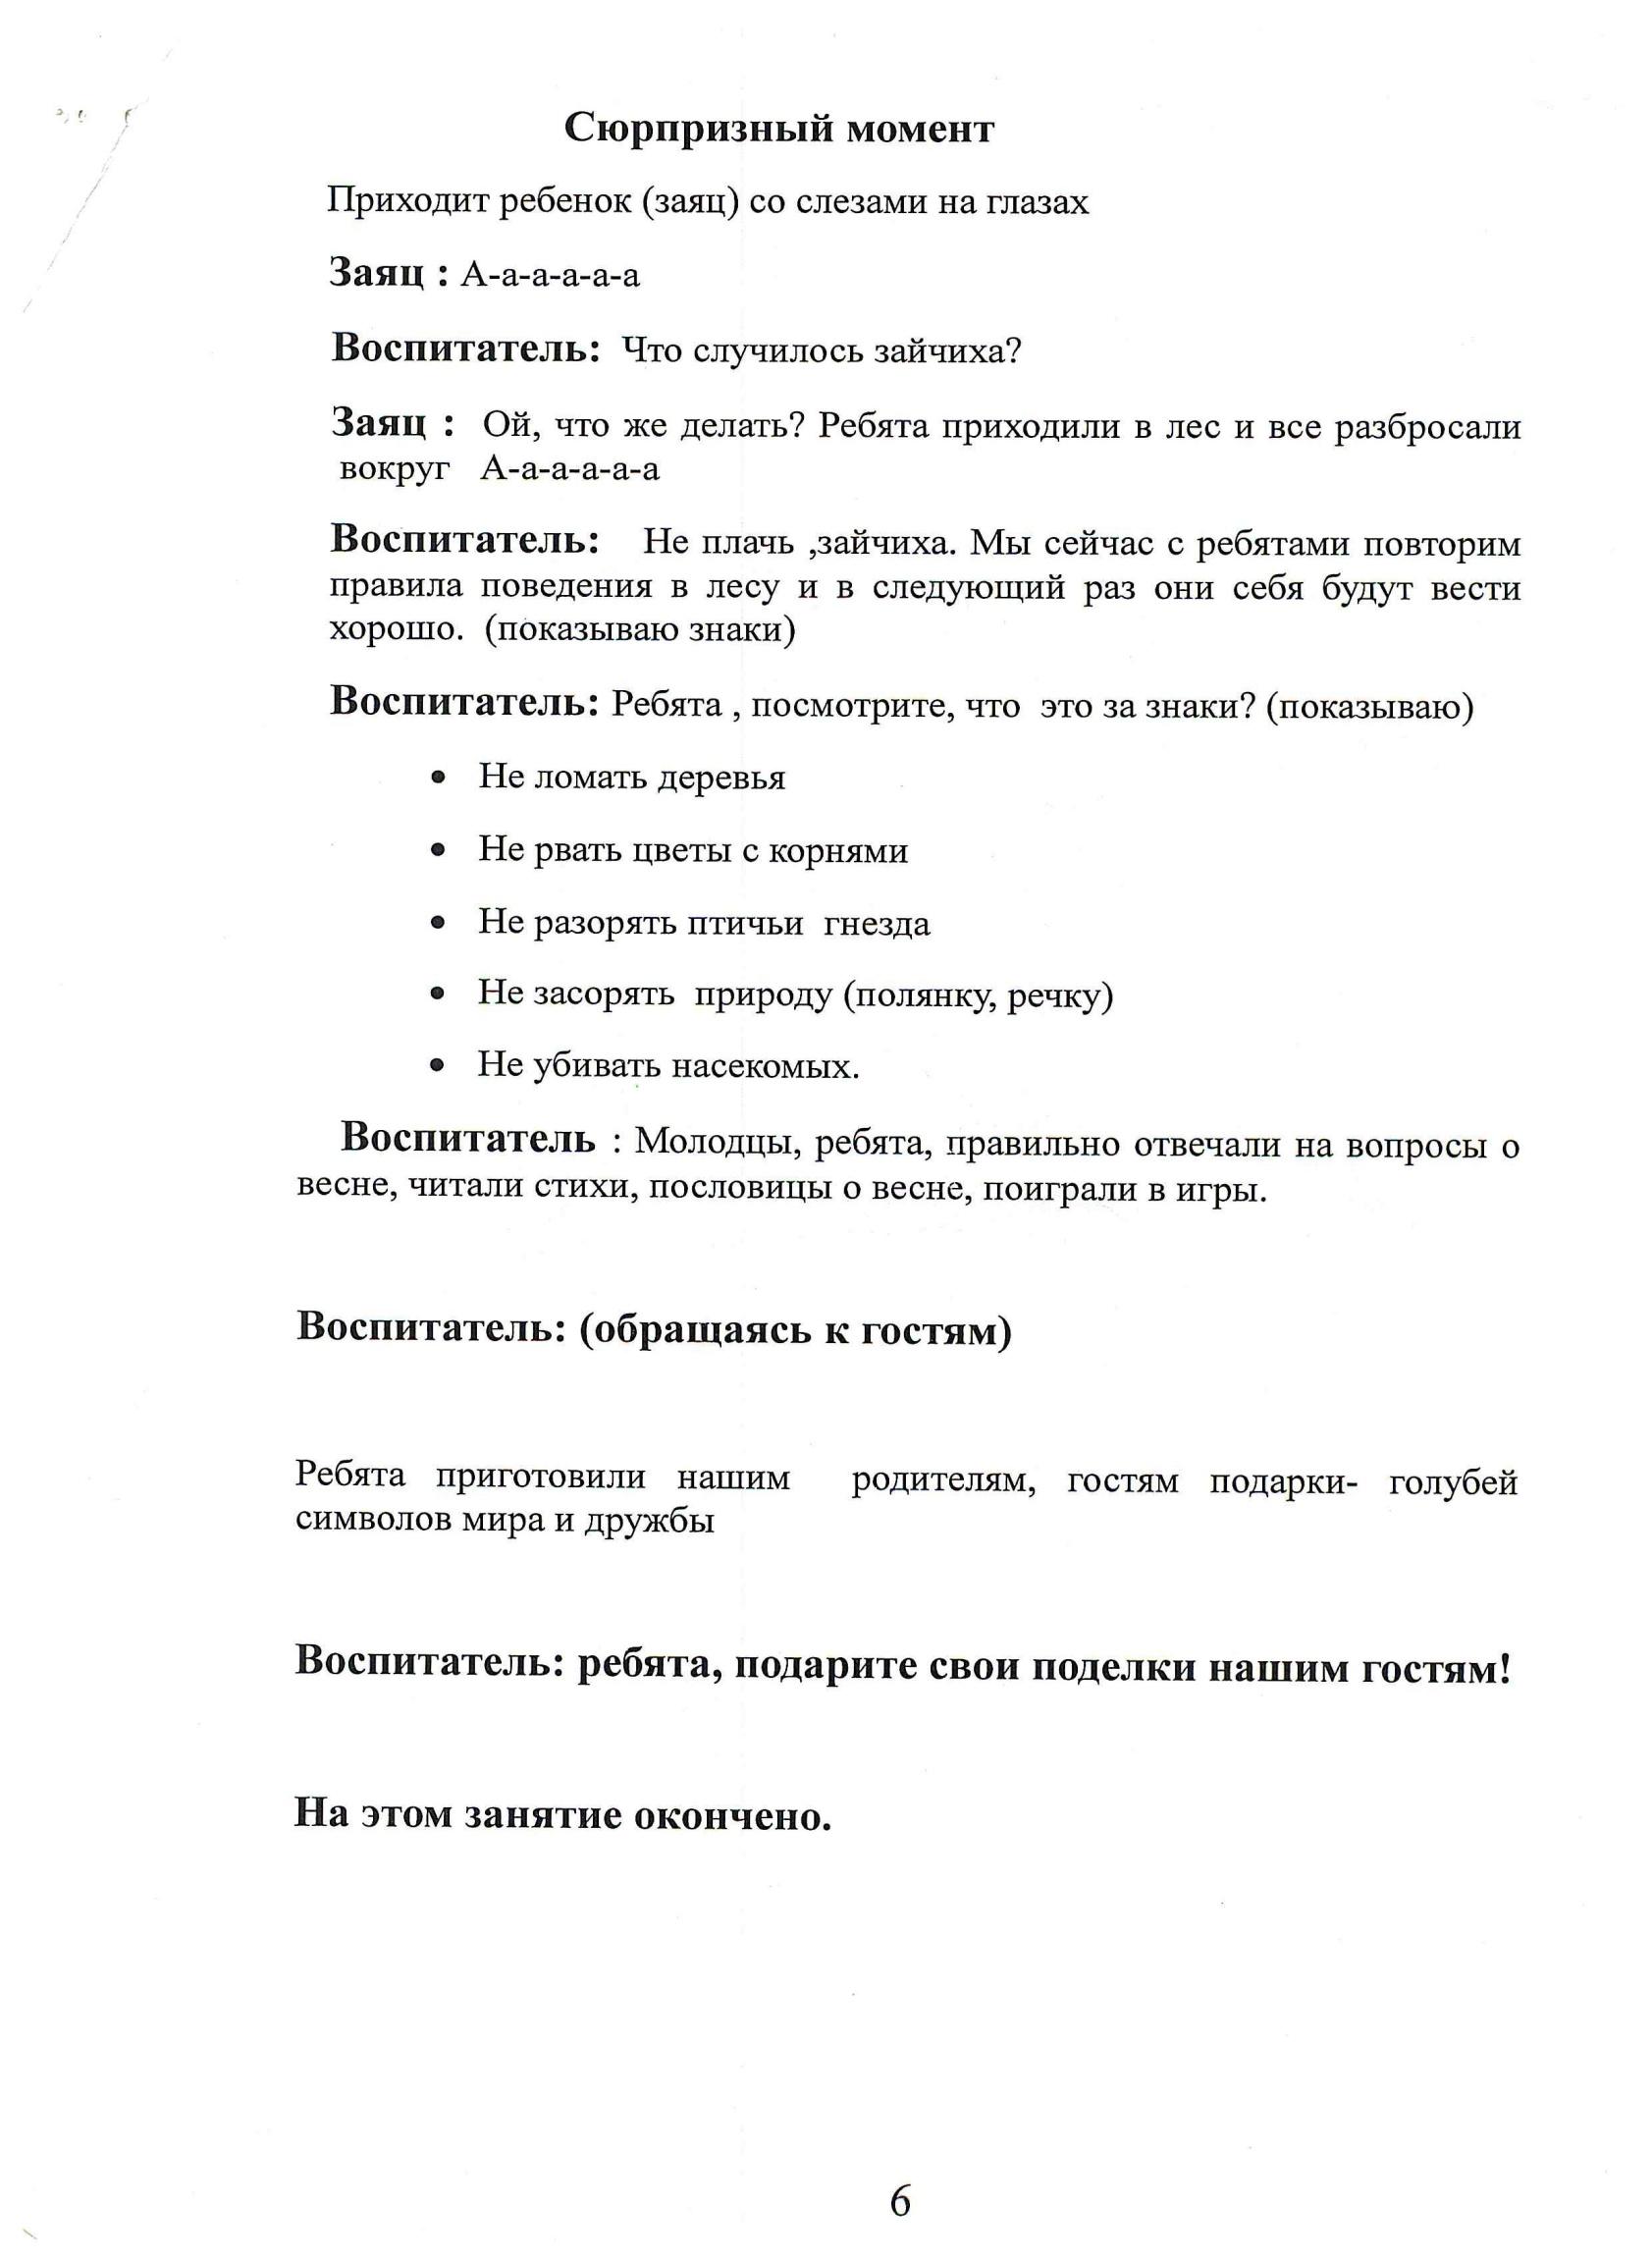 F:\Скан\doc03531820160107130539_006.jpg